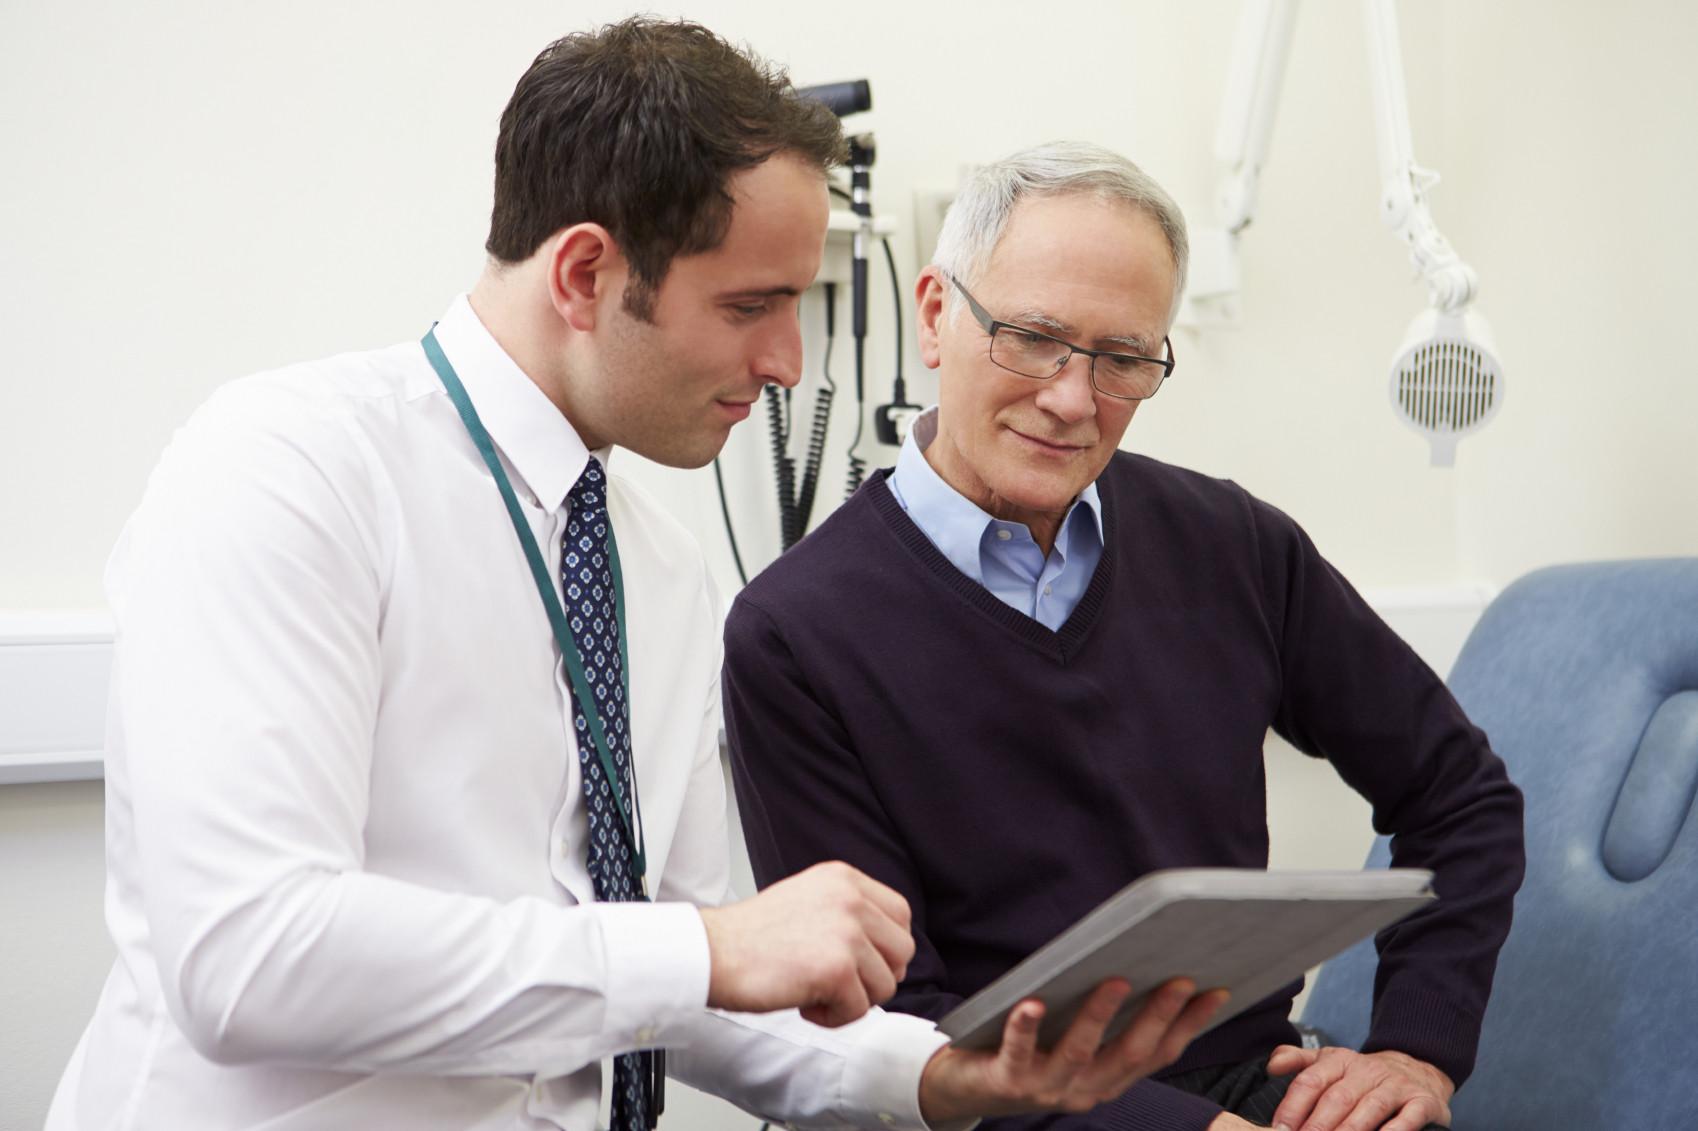 doctor-prostate-cancer-mens-iStock_000044019978_Medium